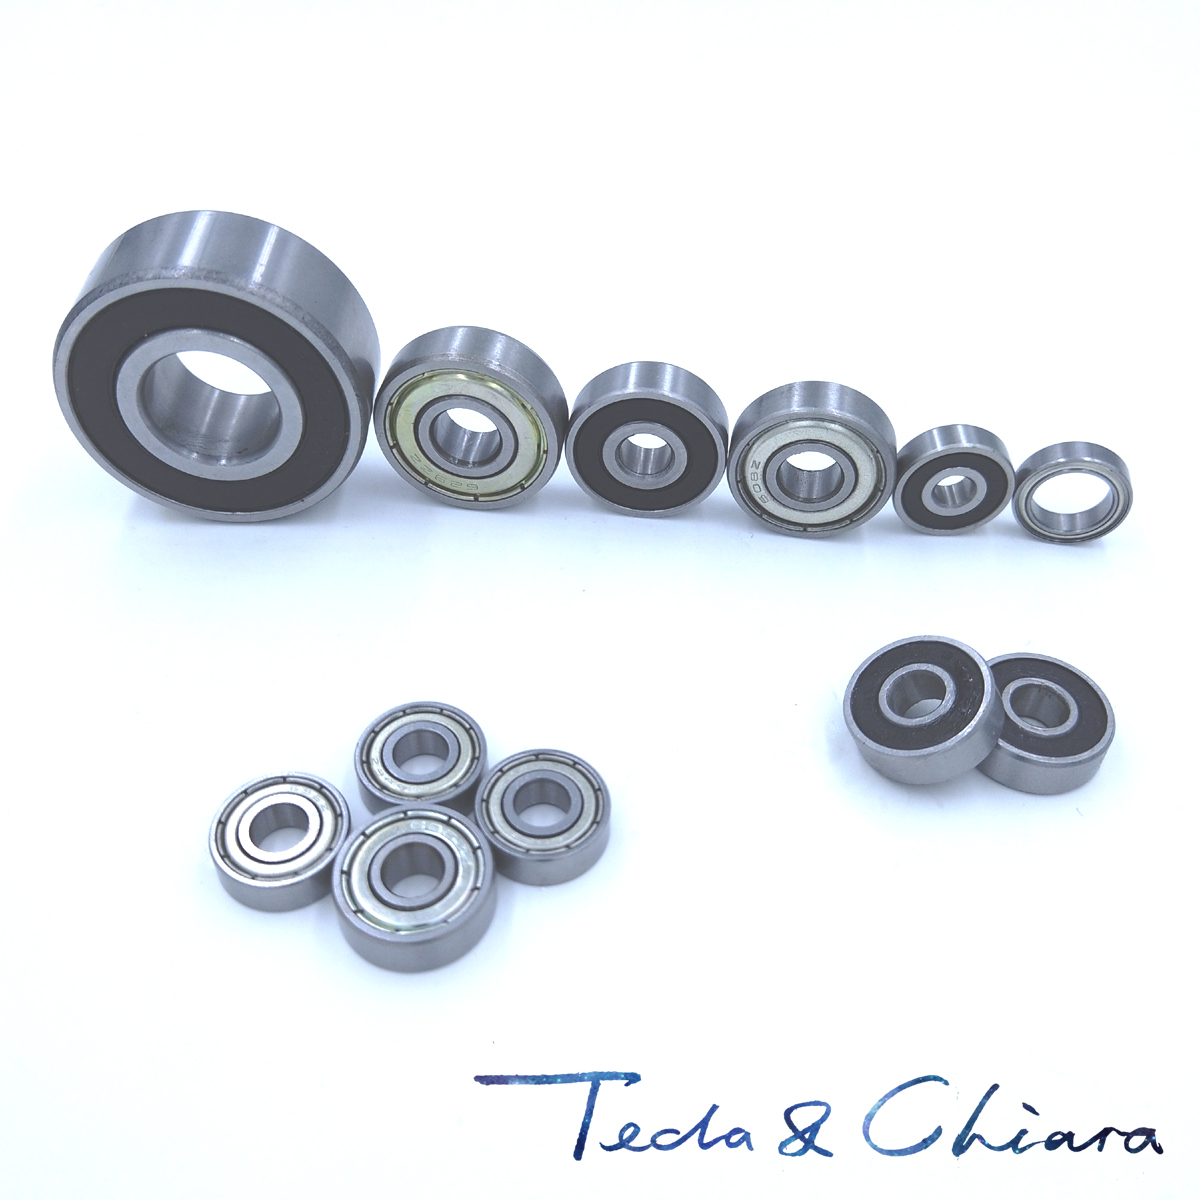 688 688ZZ 688RS 688-2Z 688Z 688-2RS ZZ RS RZ 2RZ Deep Groove Ball Bearings 8 x 16 x 5mm High Quality